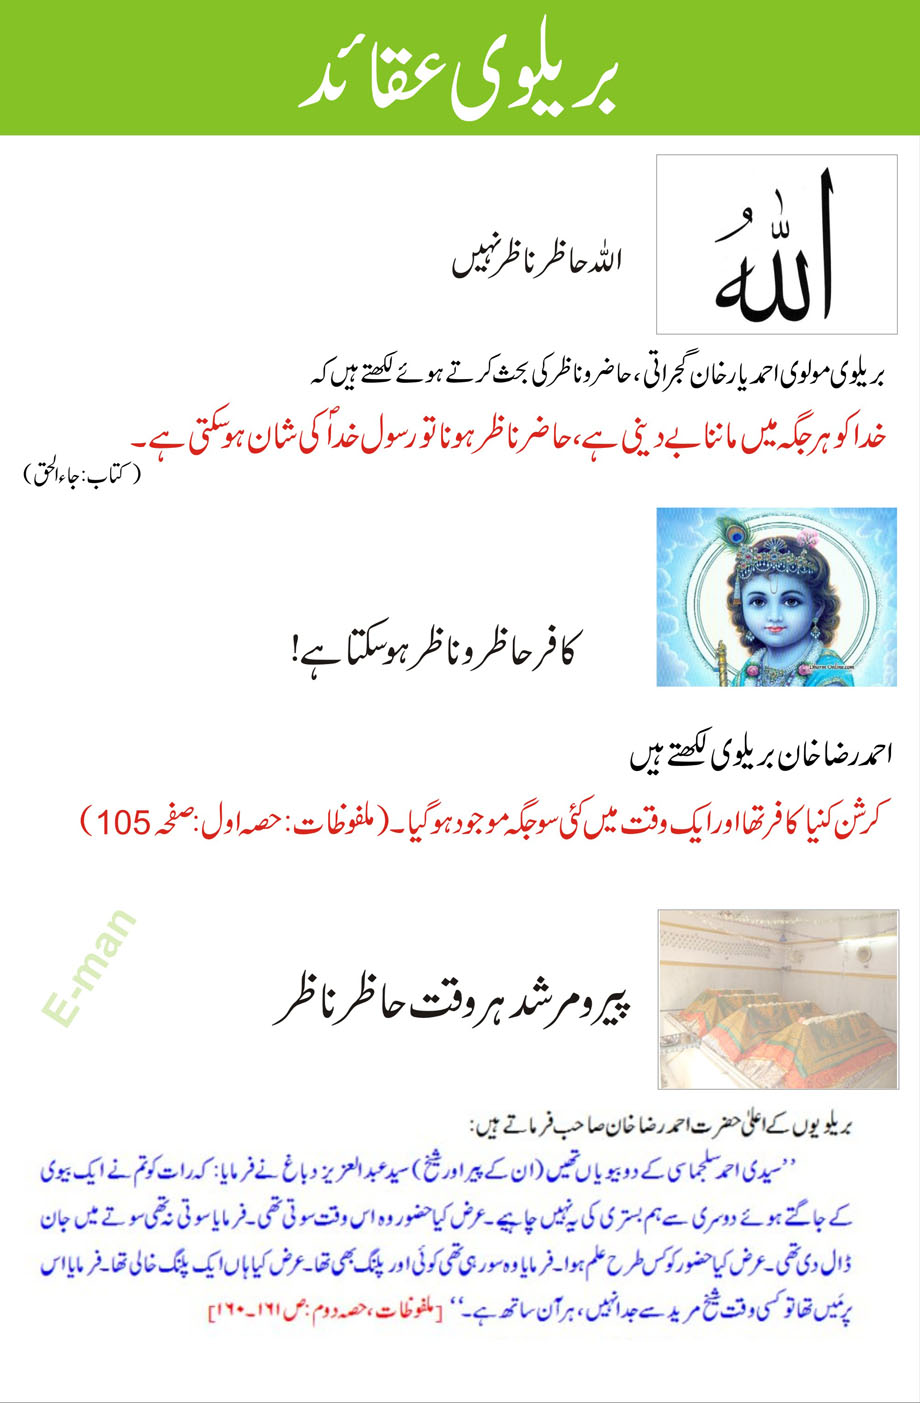 Allah+hazir+nazir.jpg